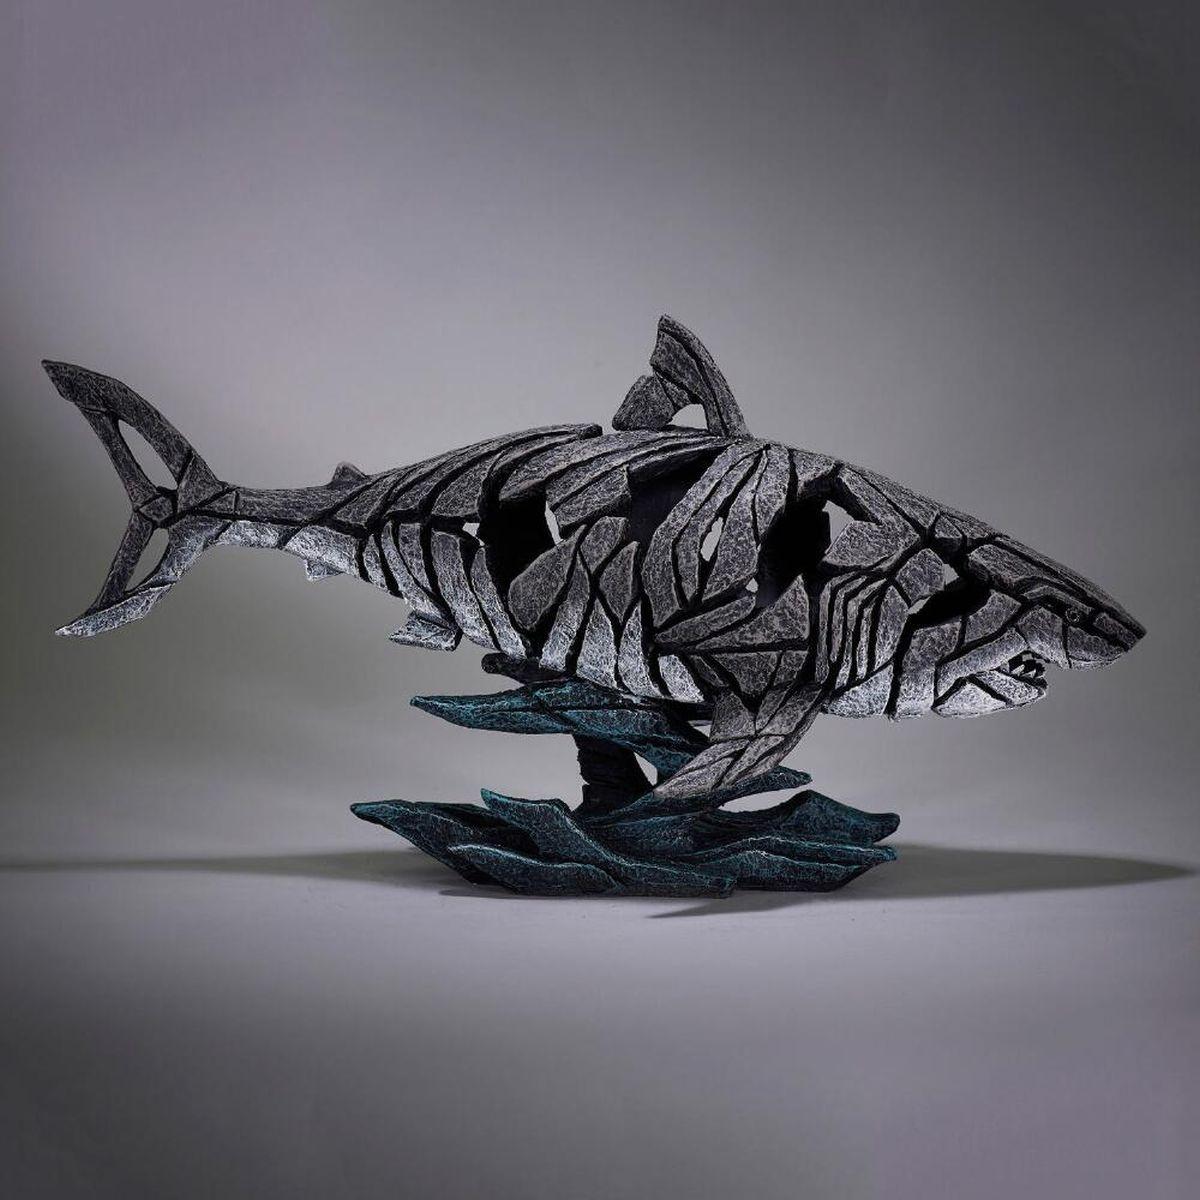 Edge Shark